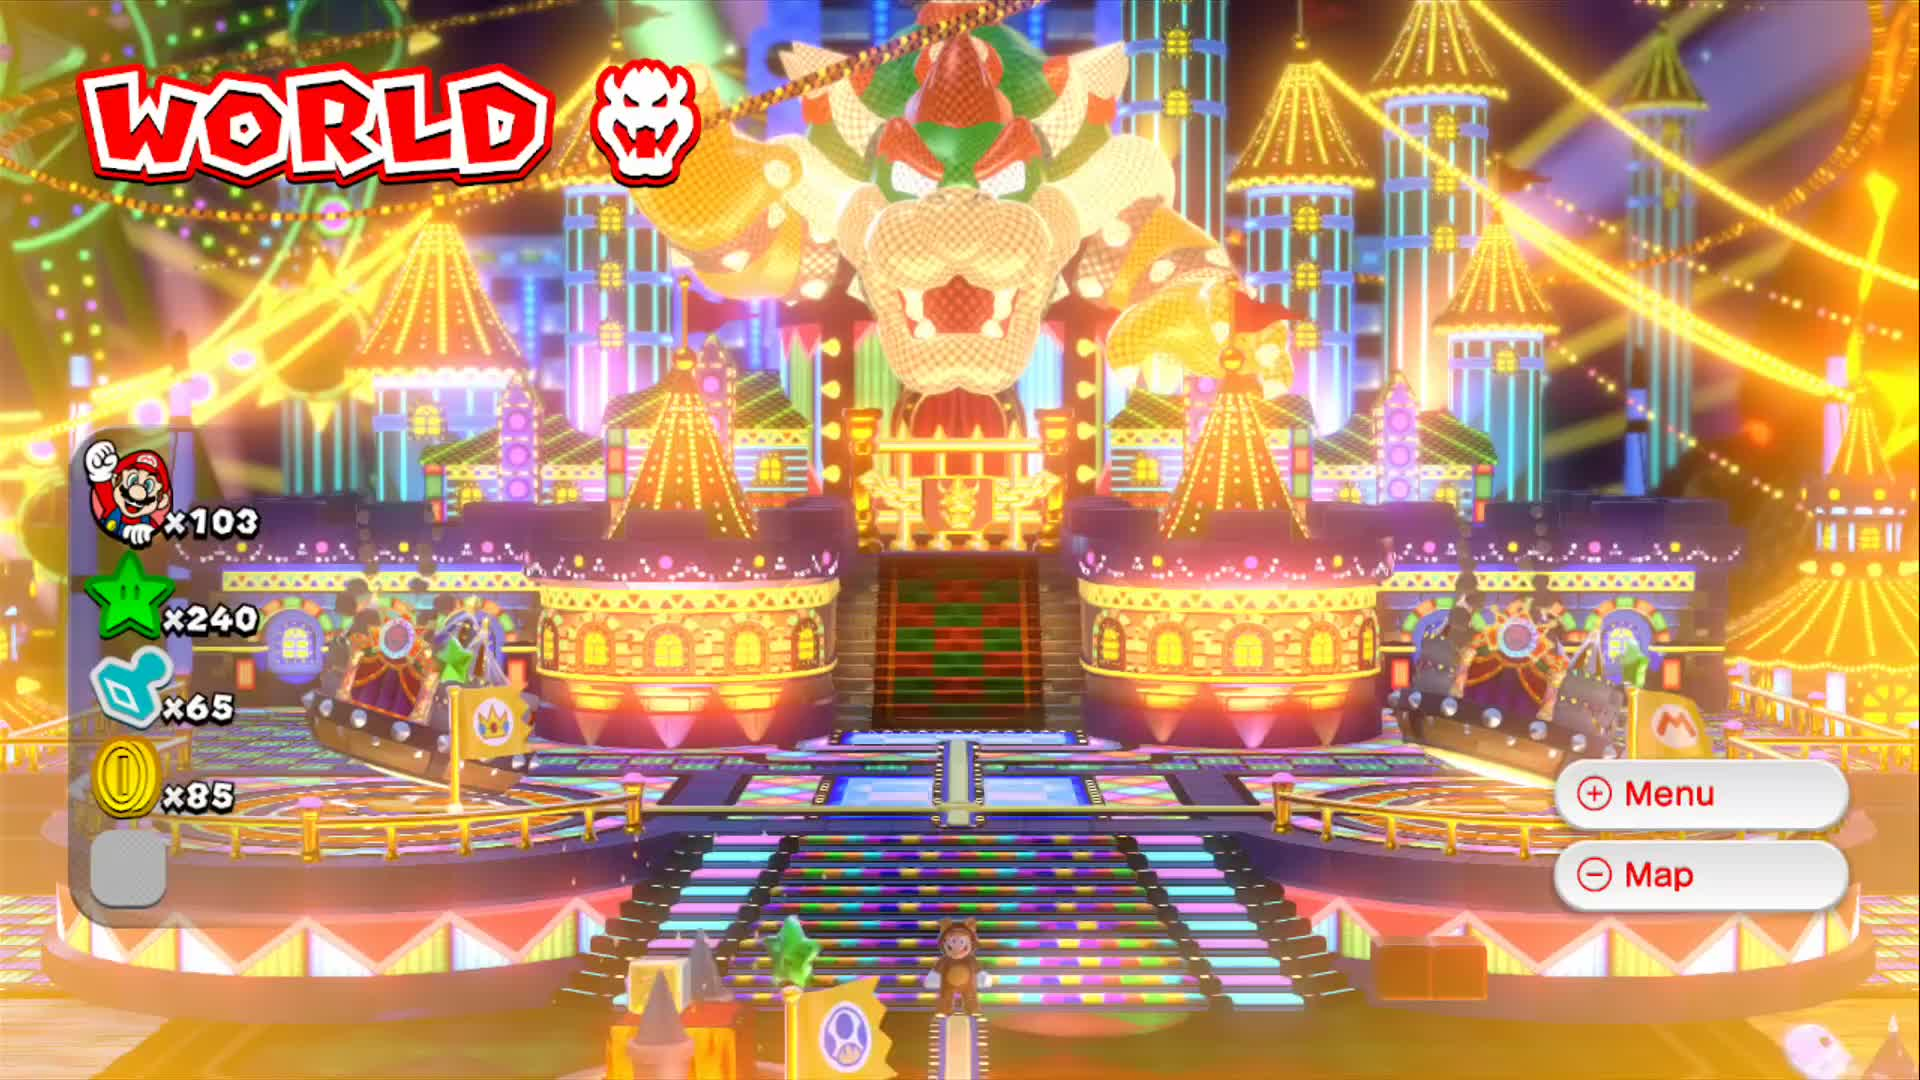 Super Mario 3d World Final Boss Gifs Search | Search & Share